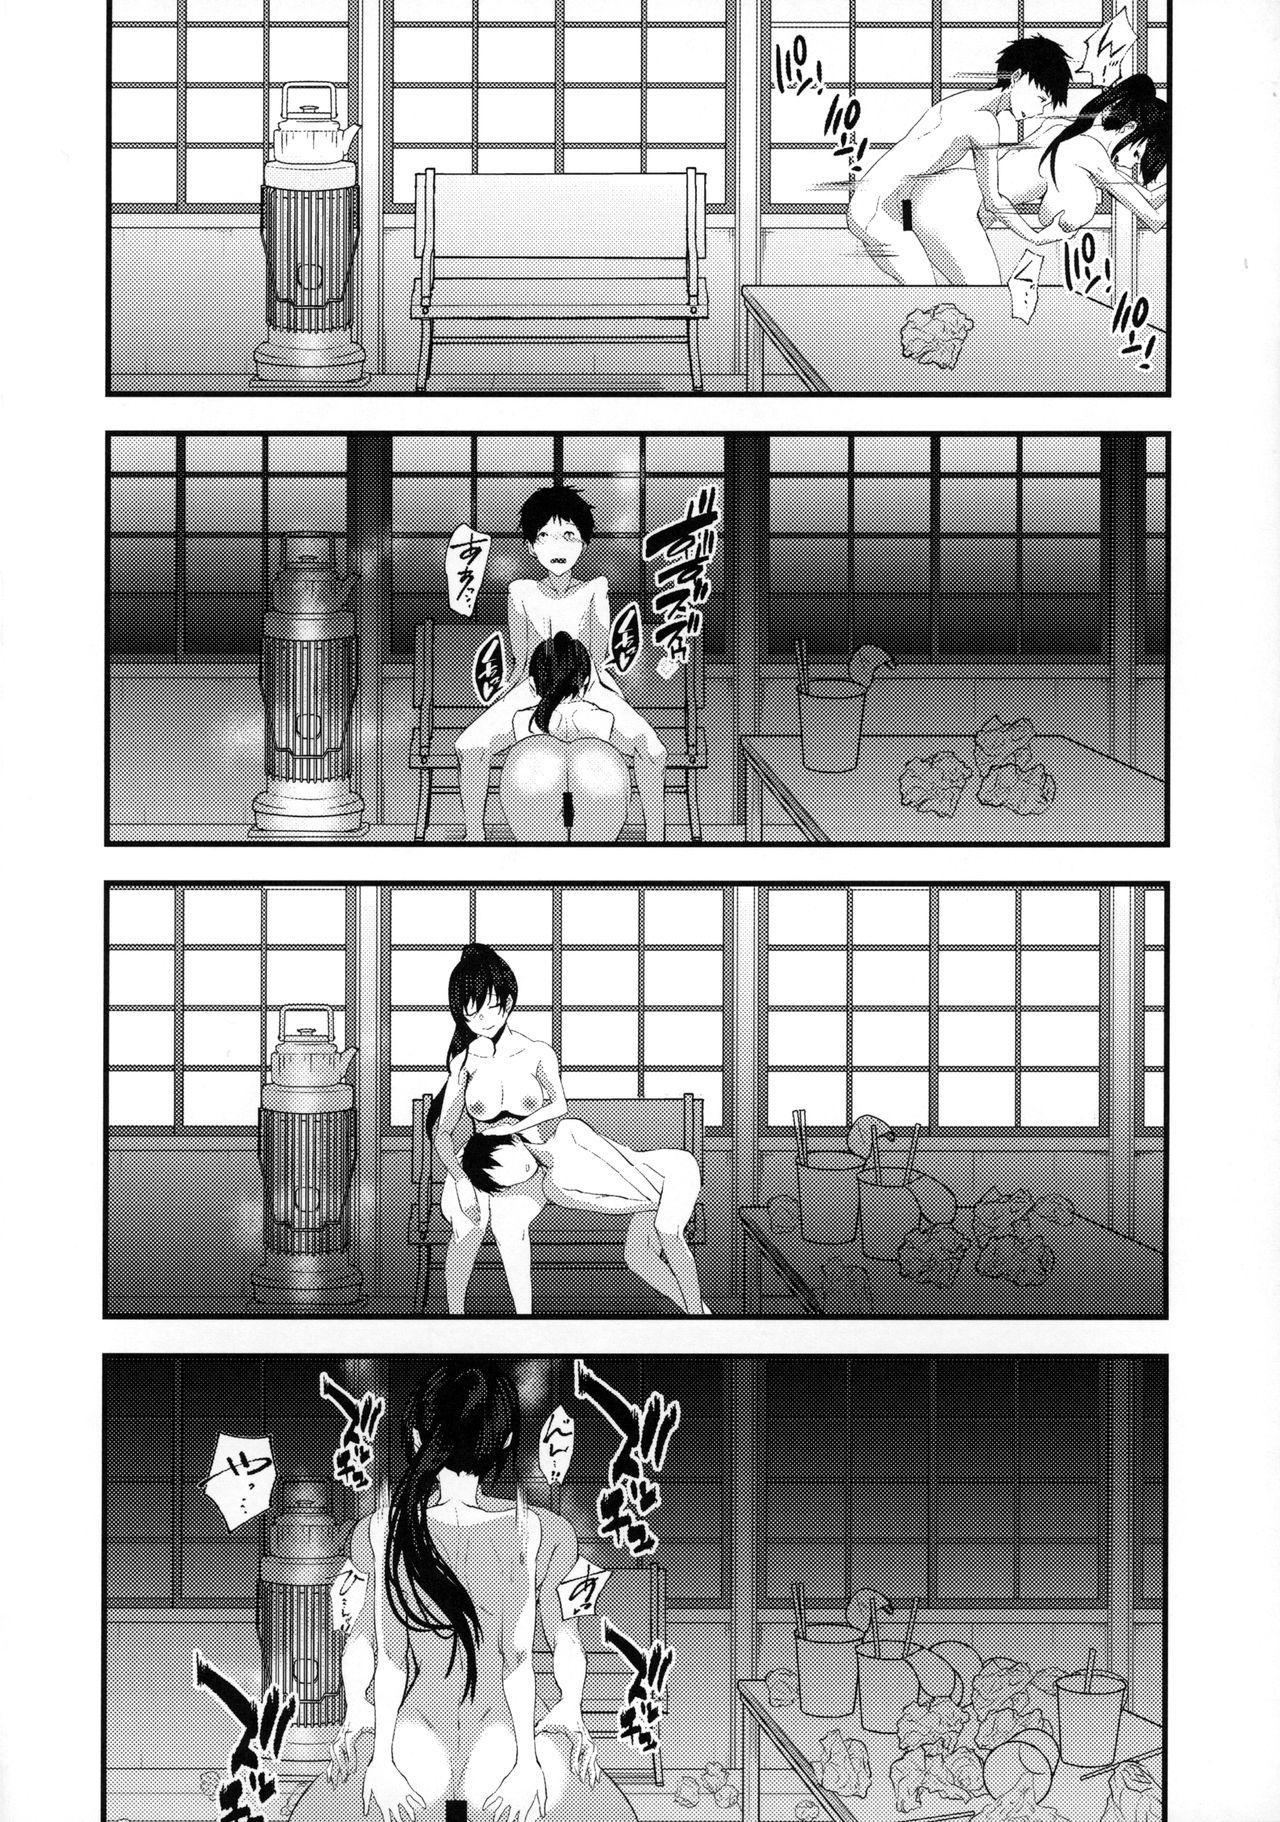 Shirase Sakuya to Ecchi na Sounan | Shirase Sakuya and Naughty Distress 20